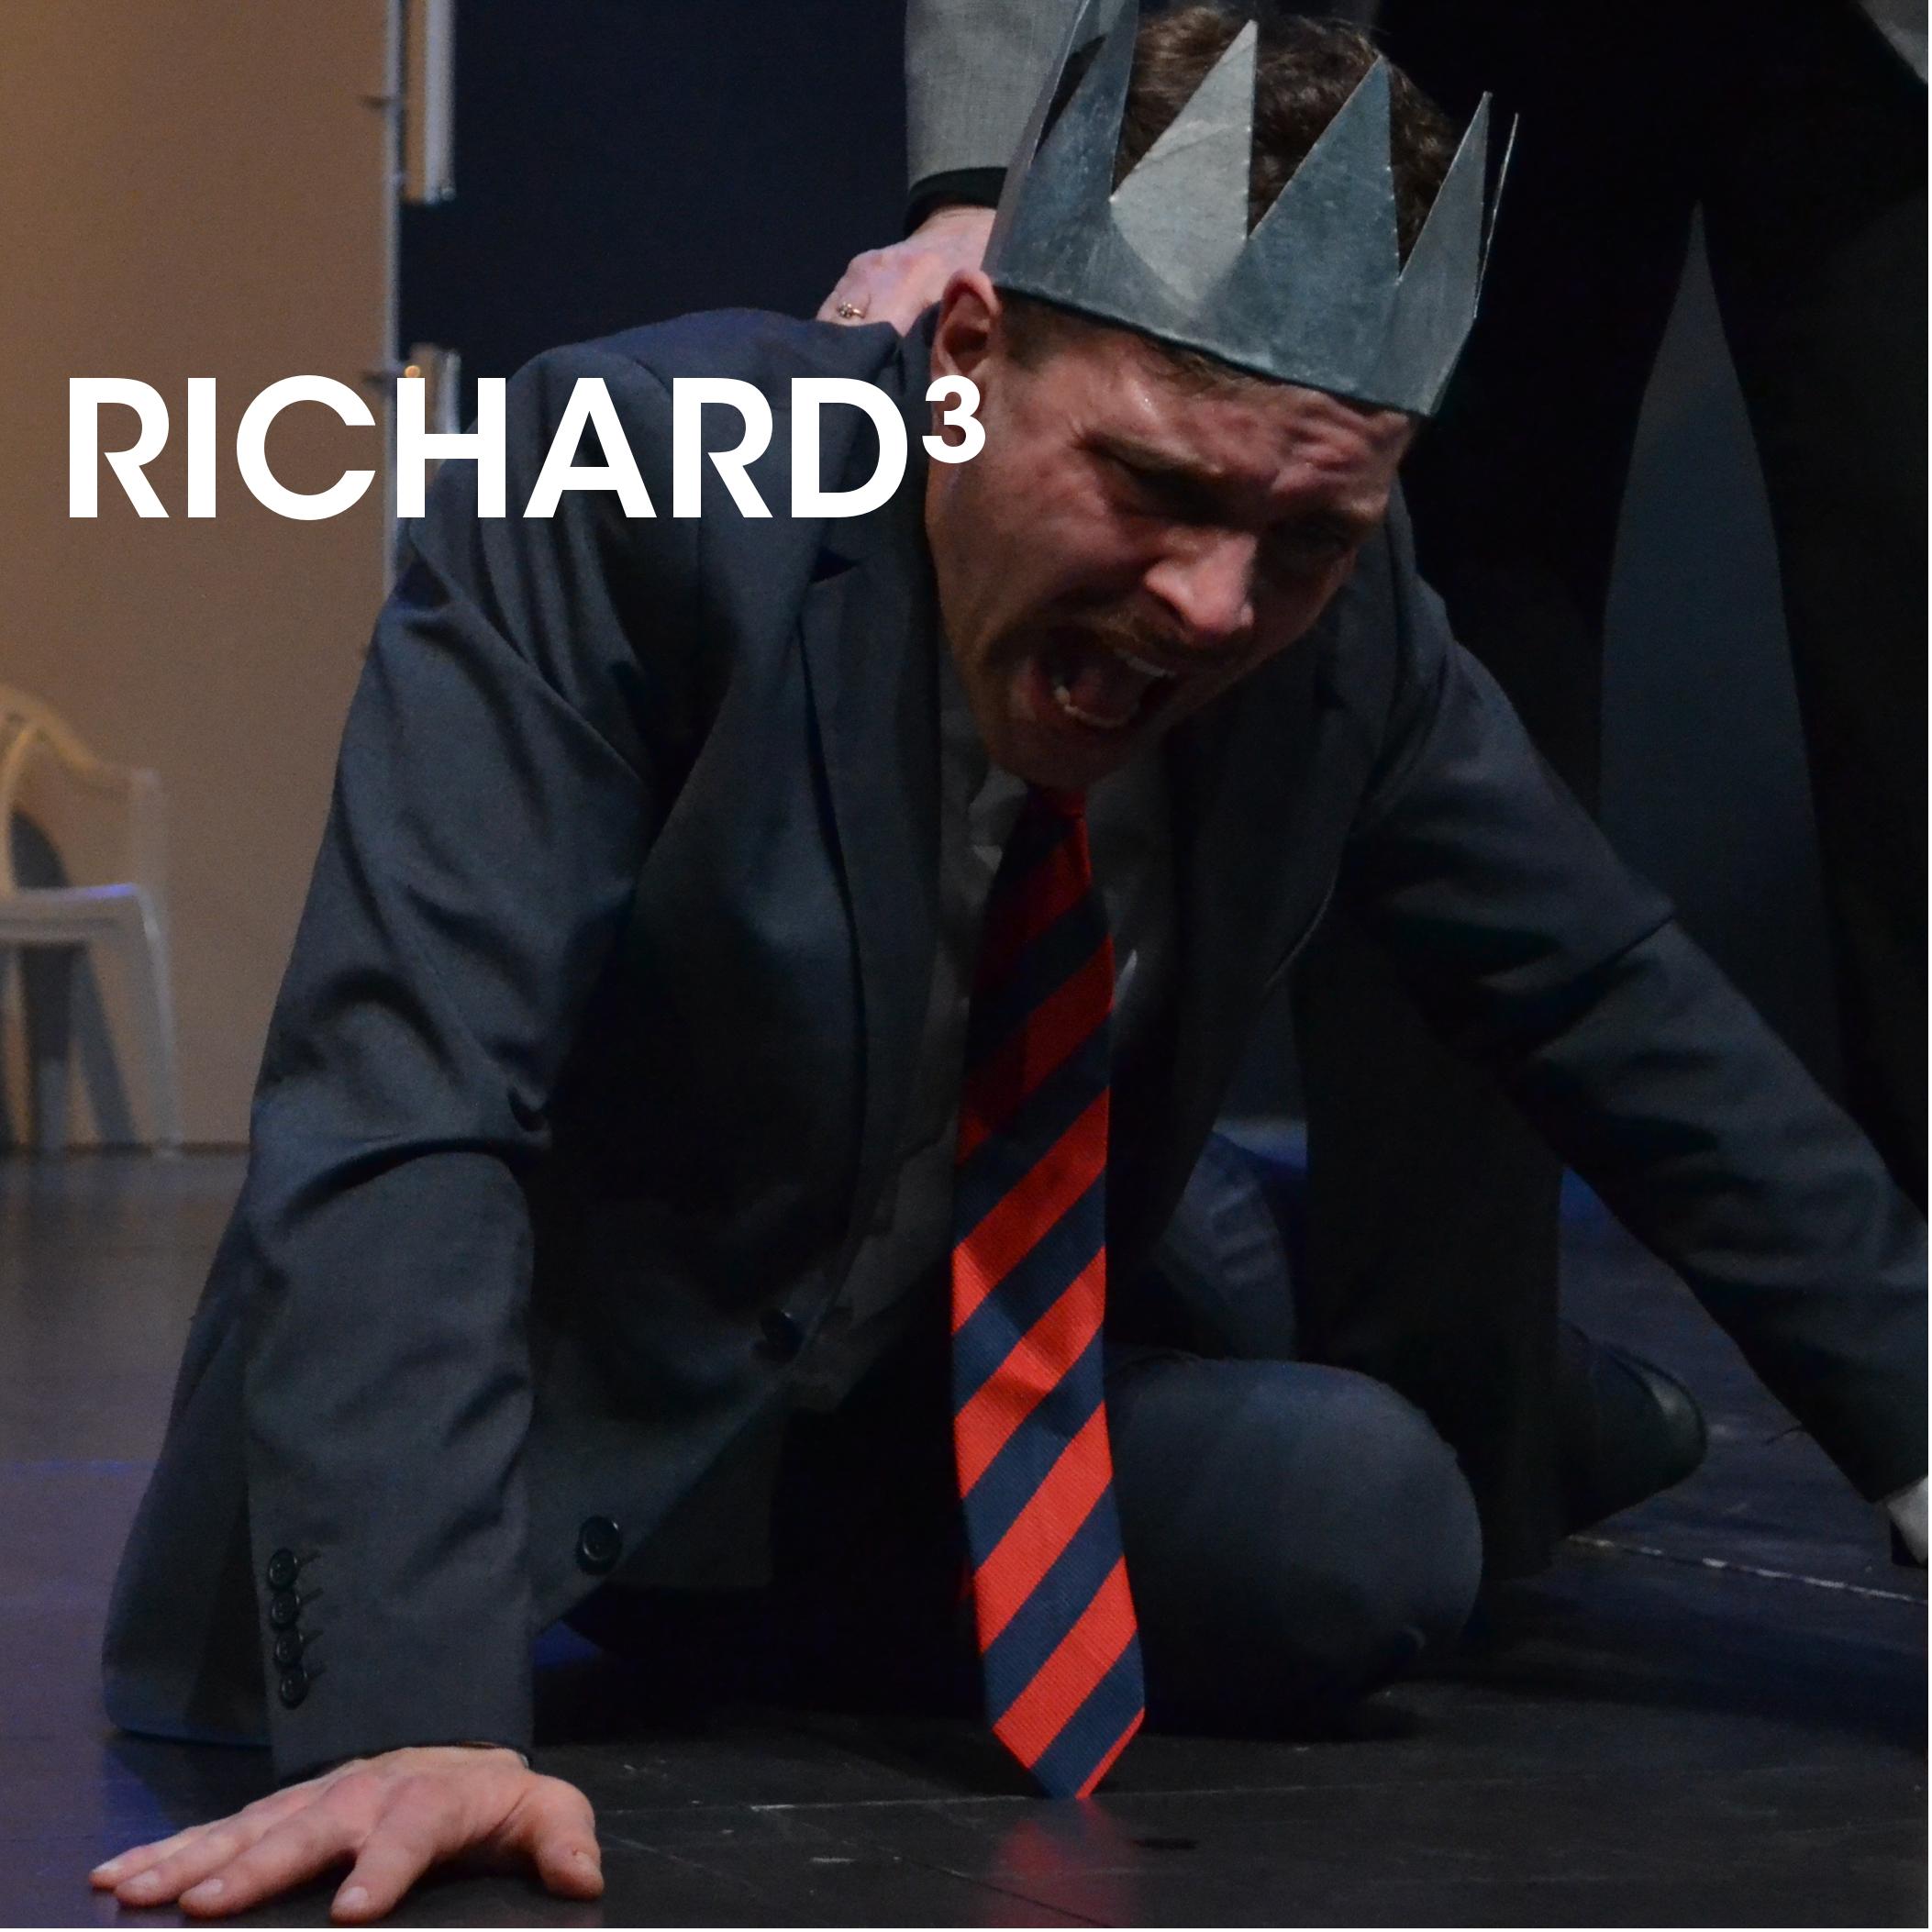 richard3.png